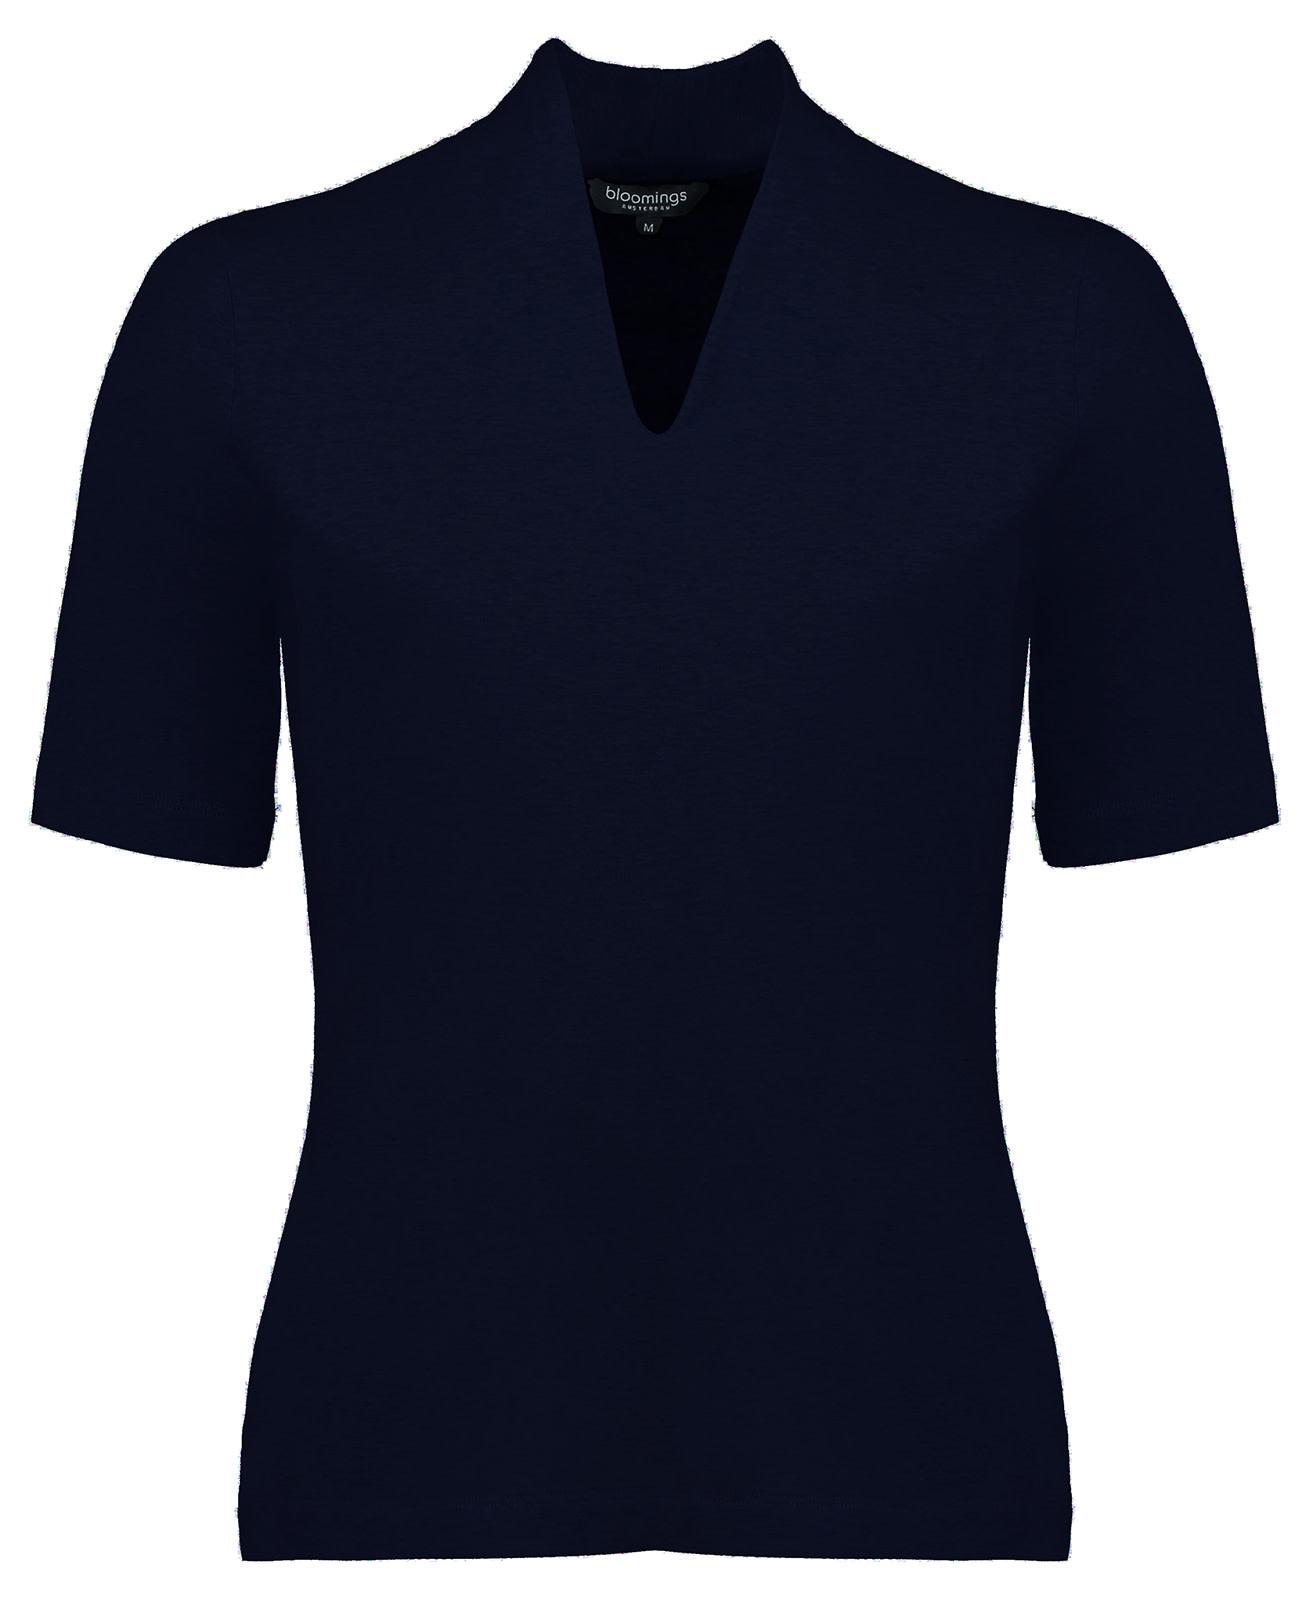 Tulip Collar Shirt - Navy